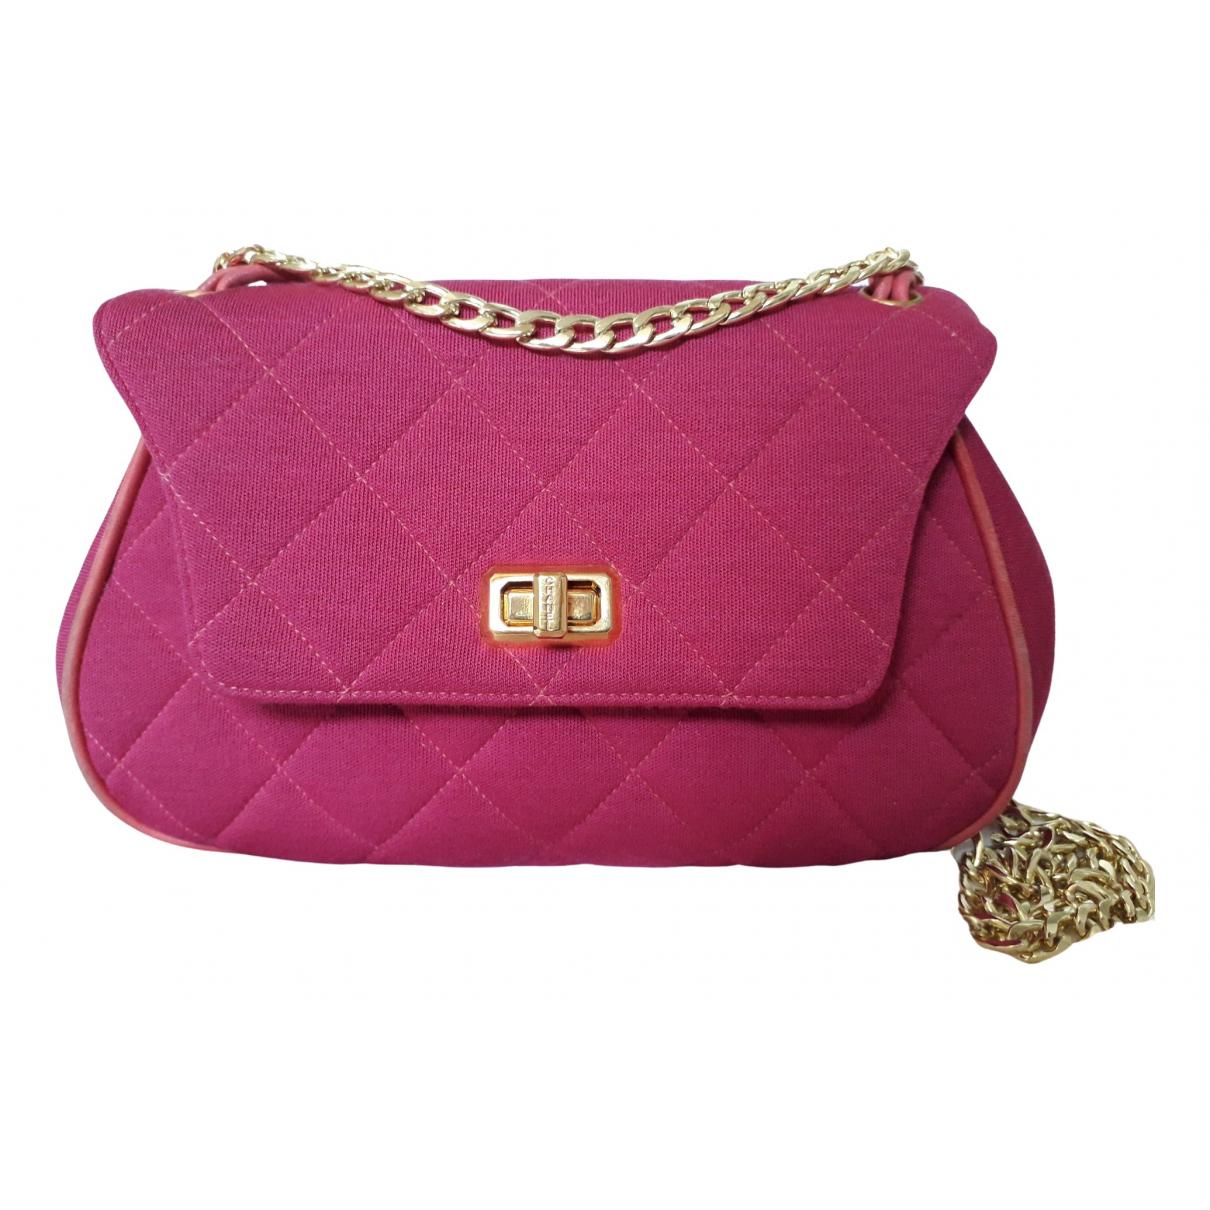 Chanel 2.55 Pink Cloth handbag for Women \N